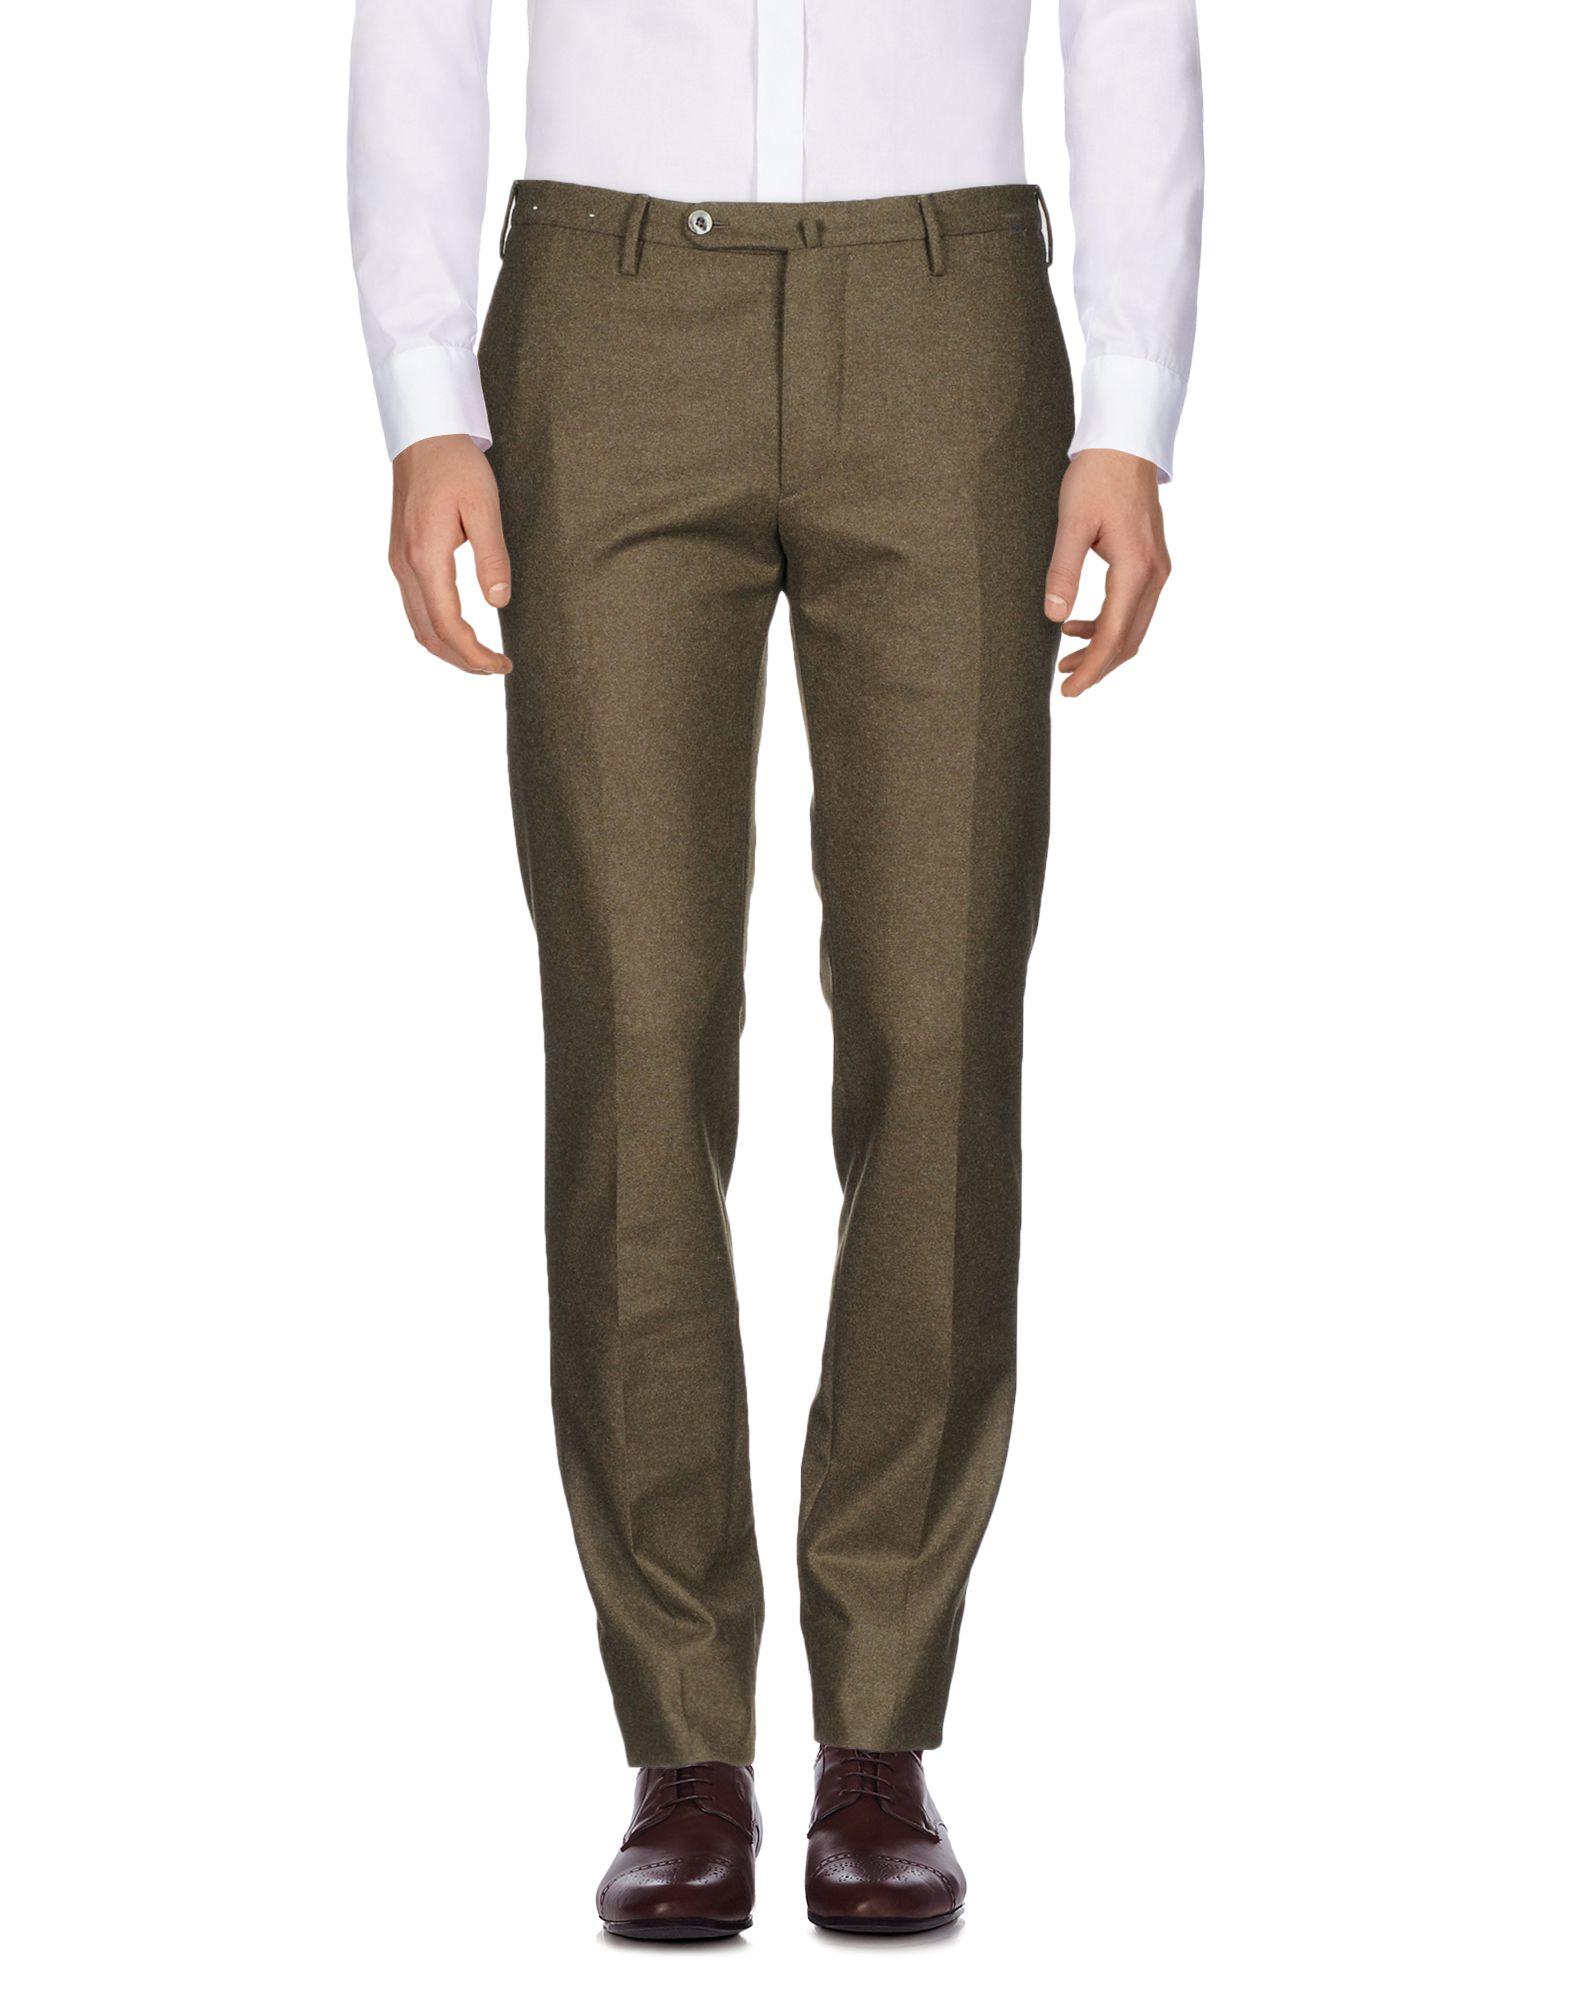 Pantalone G.T.A. Manifattura Pantaloni Donna - Acquista online su YOOX -  13175775GP